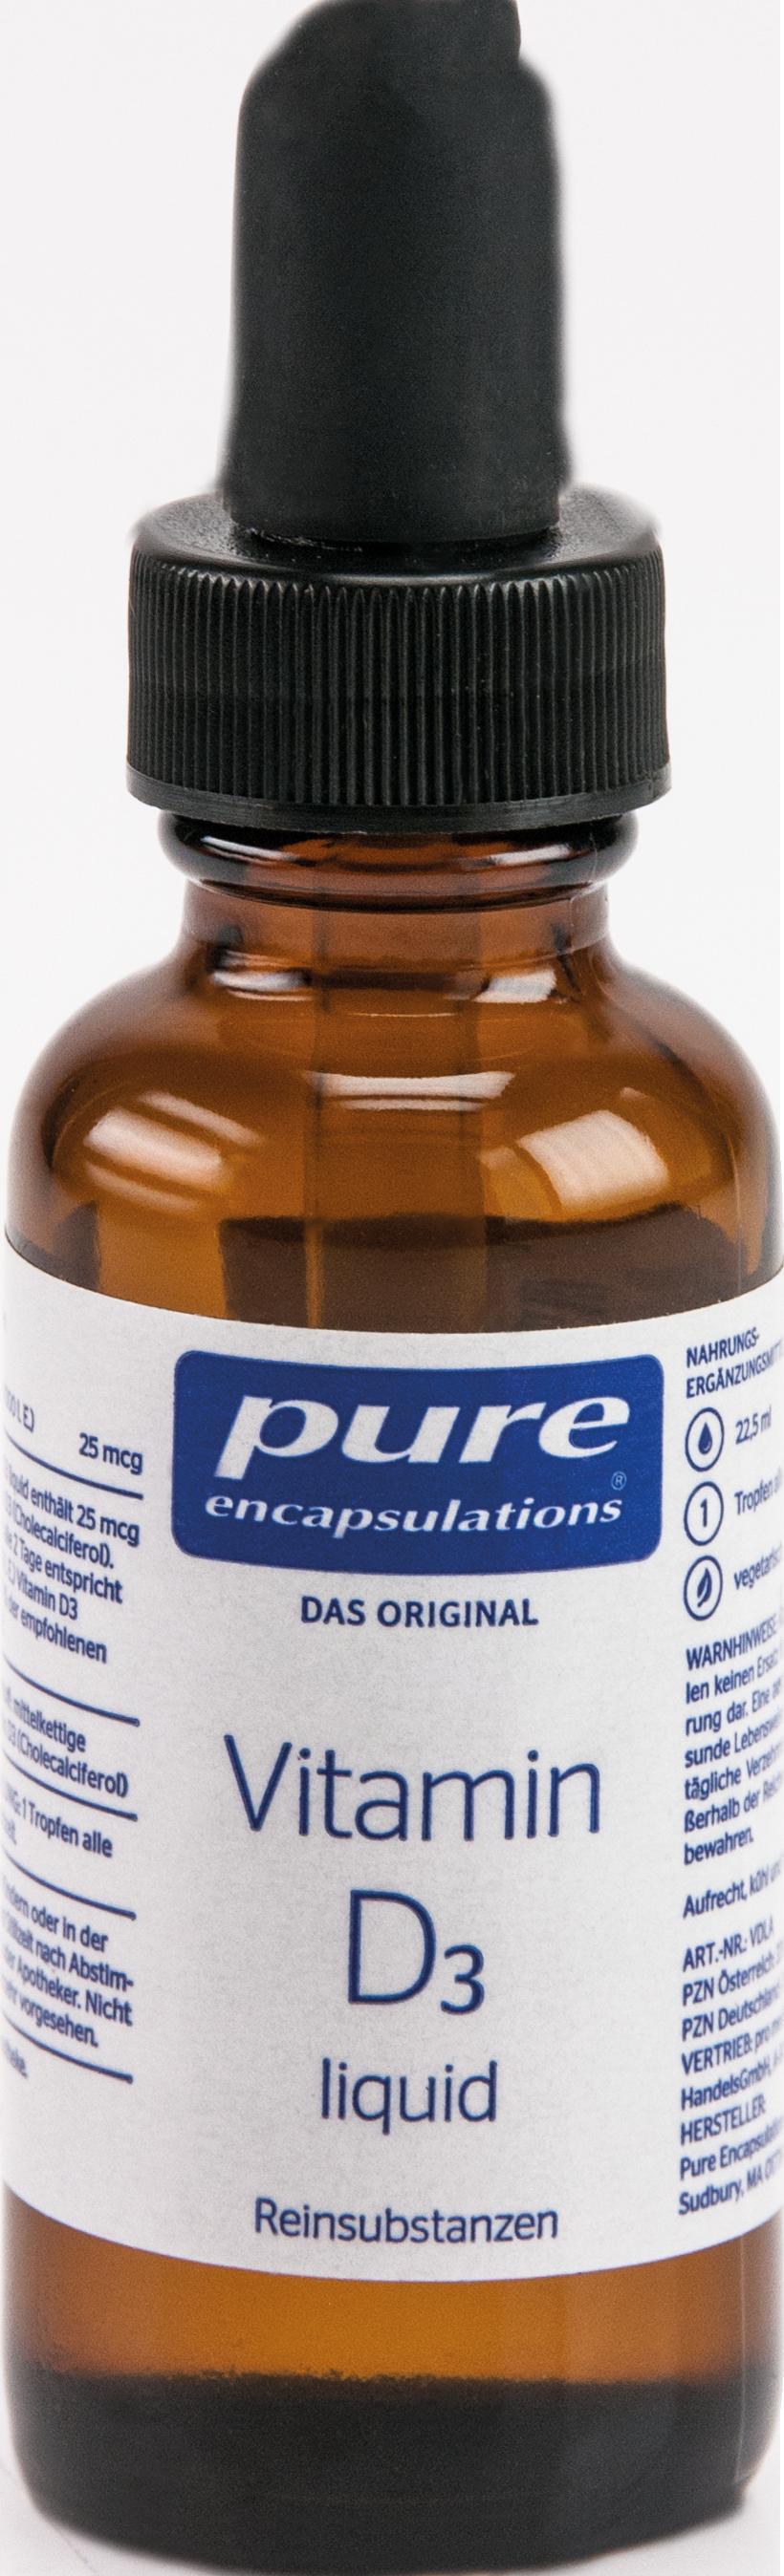 PURE ENCAPSULATIONS Vitamin D3 Liquid